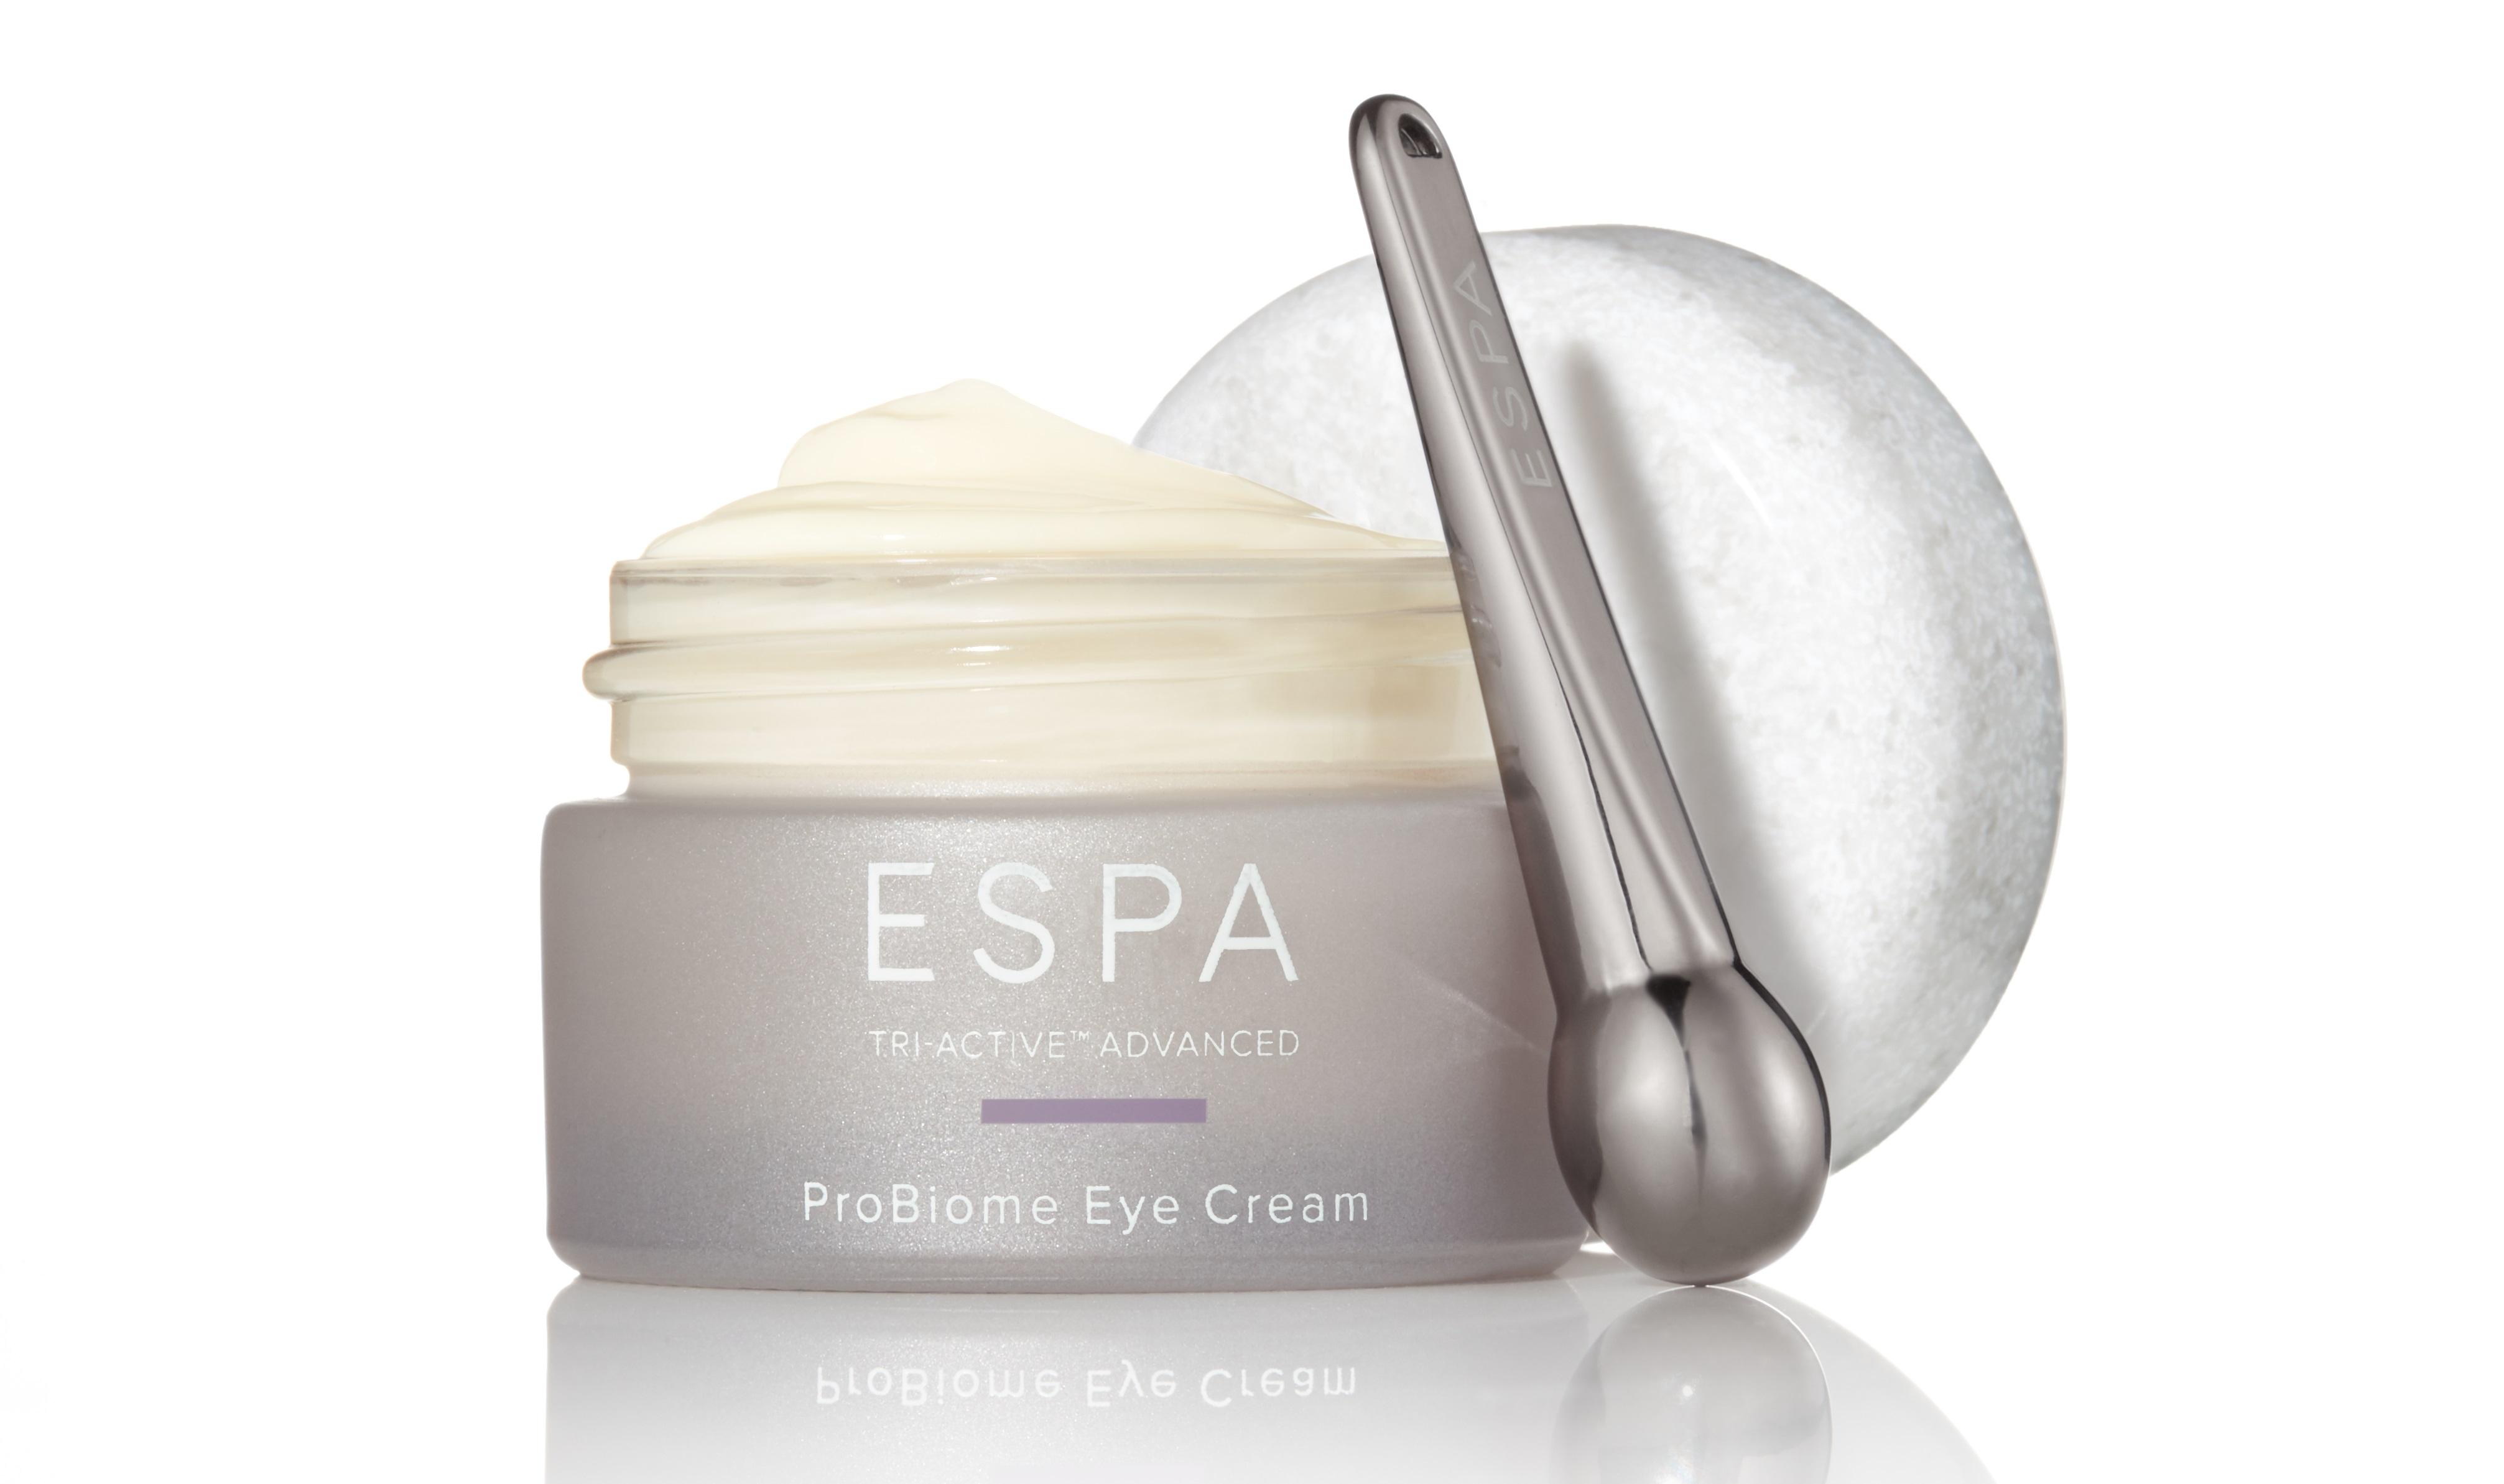 ESPA Natural Face Lift Facial